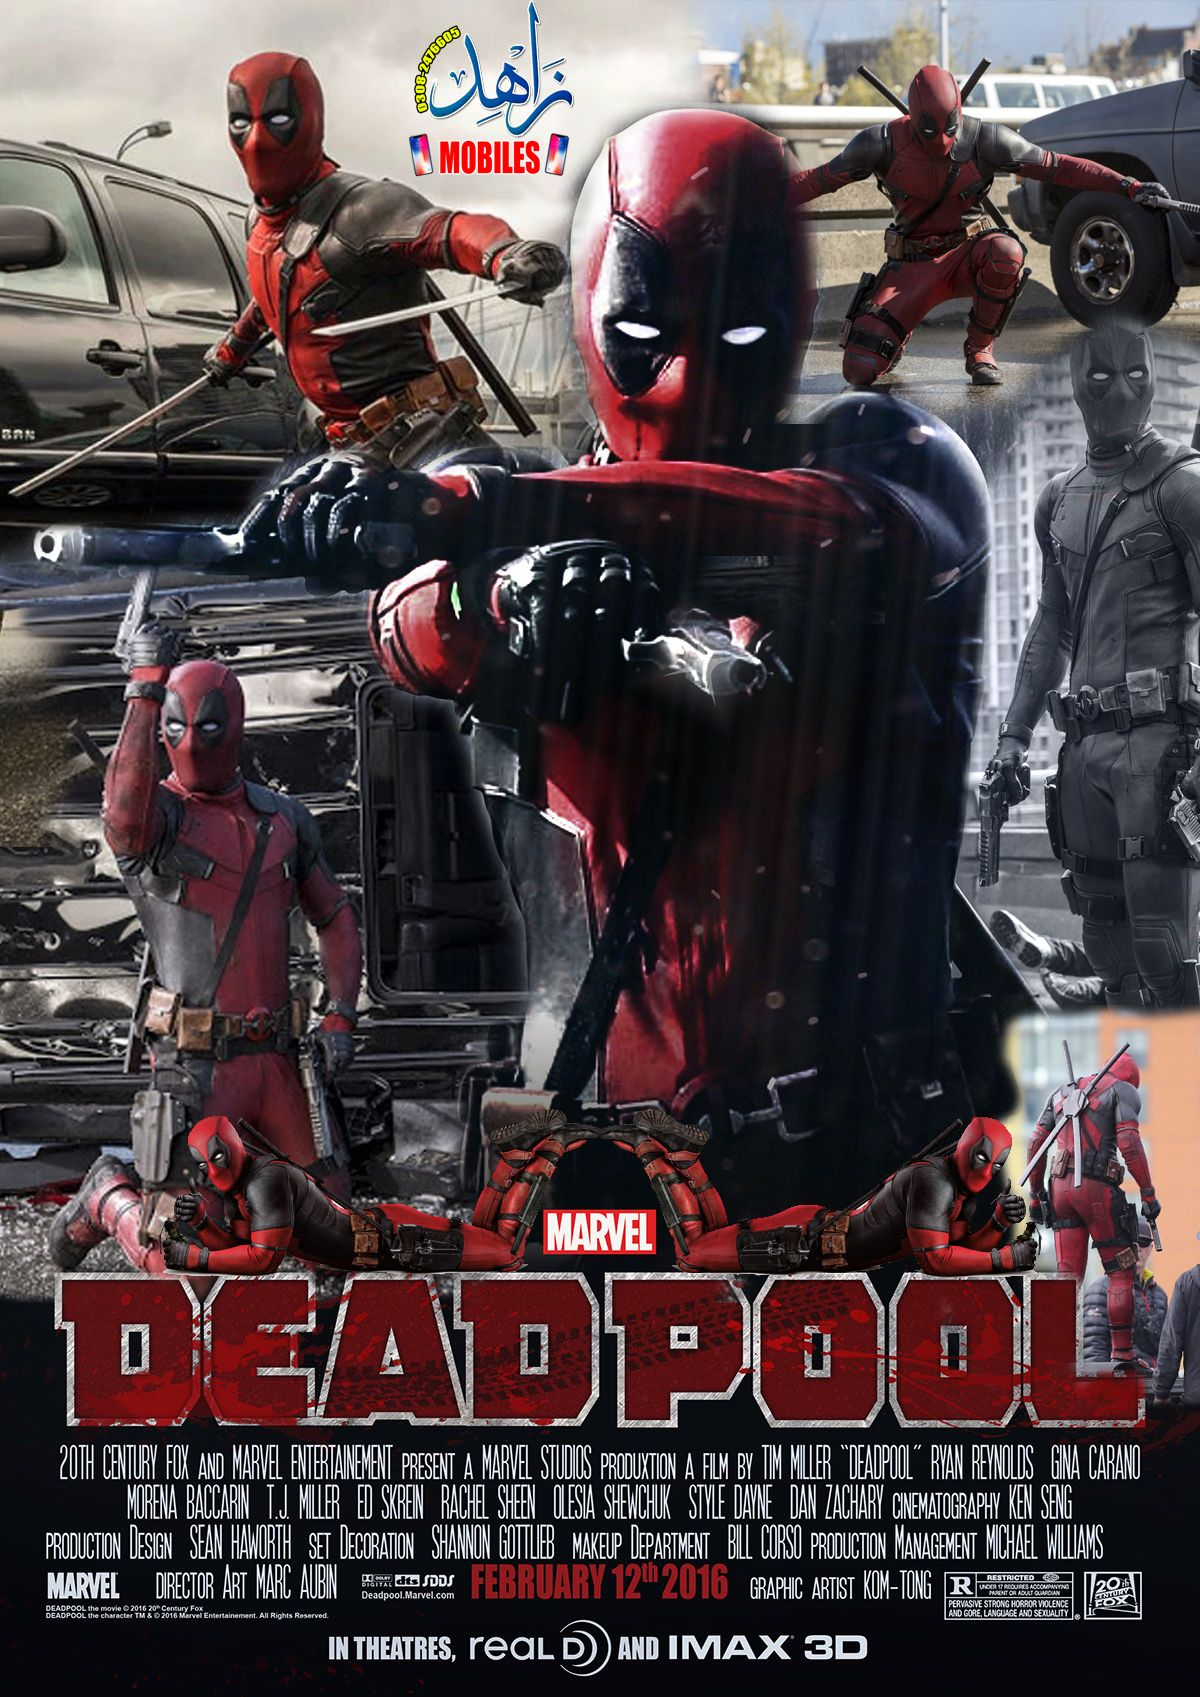 Deadpool 2016 Hindi Dubbed Movie Hdrip 720p 750mb In 2020 Deadpool 2016 Deadpool Marvel Deadpool